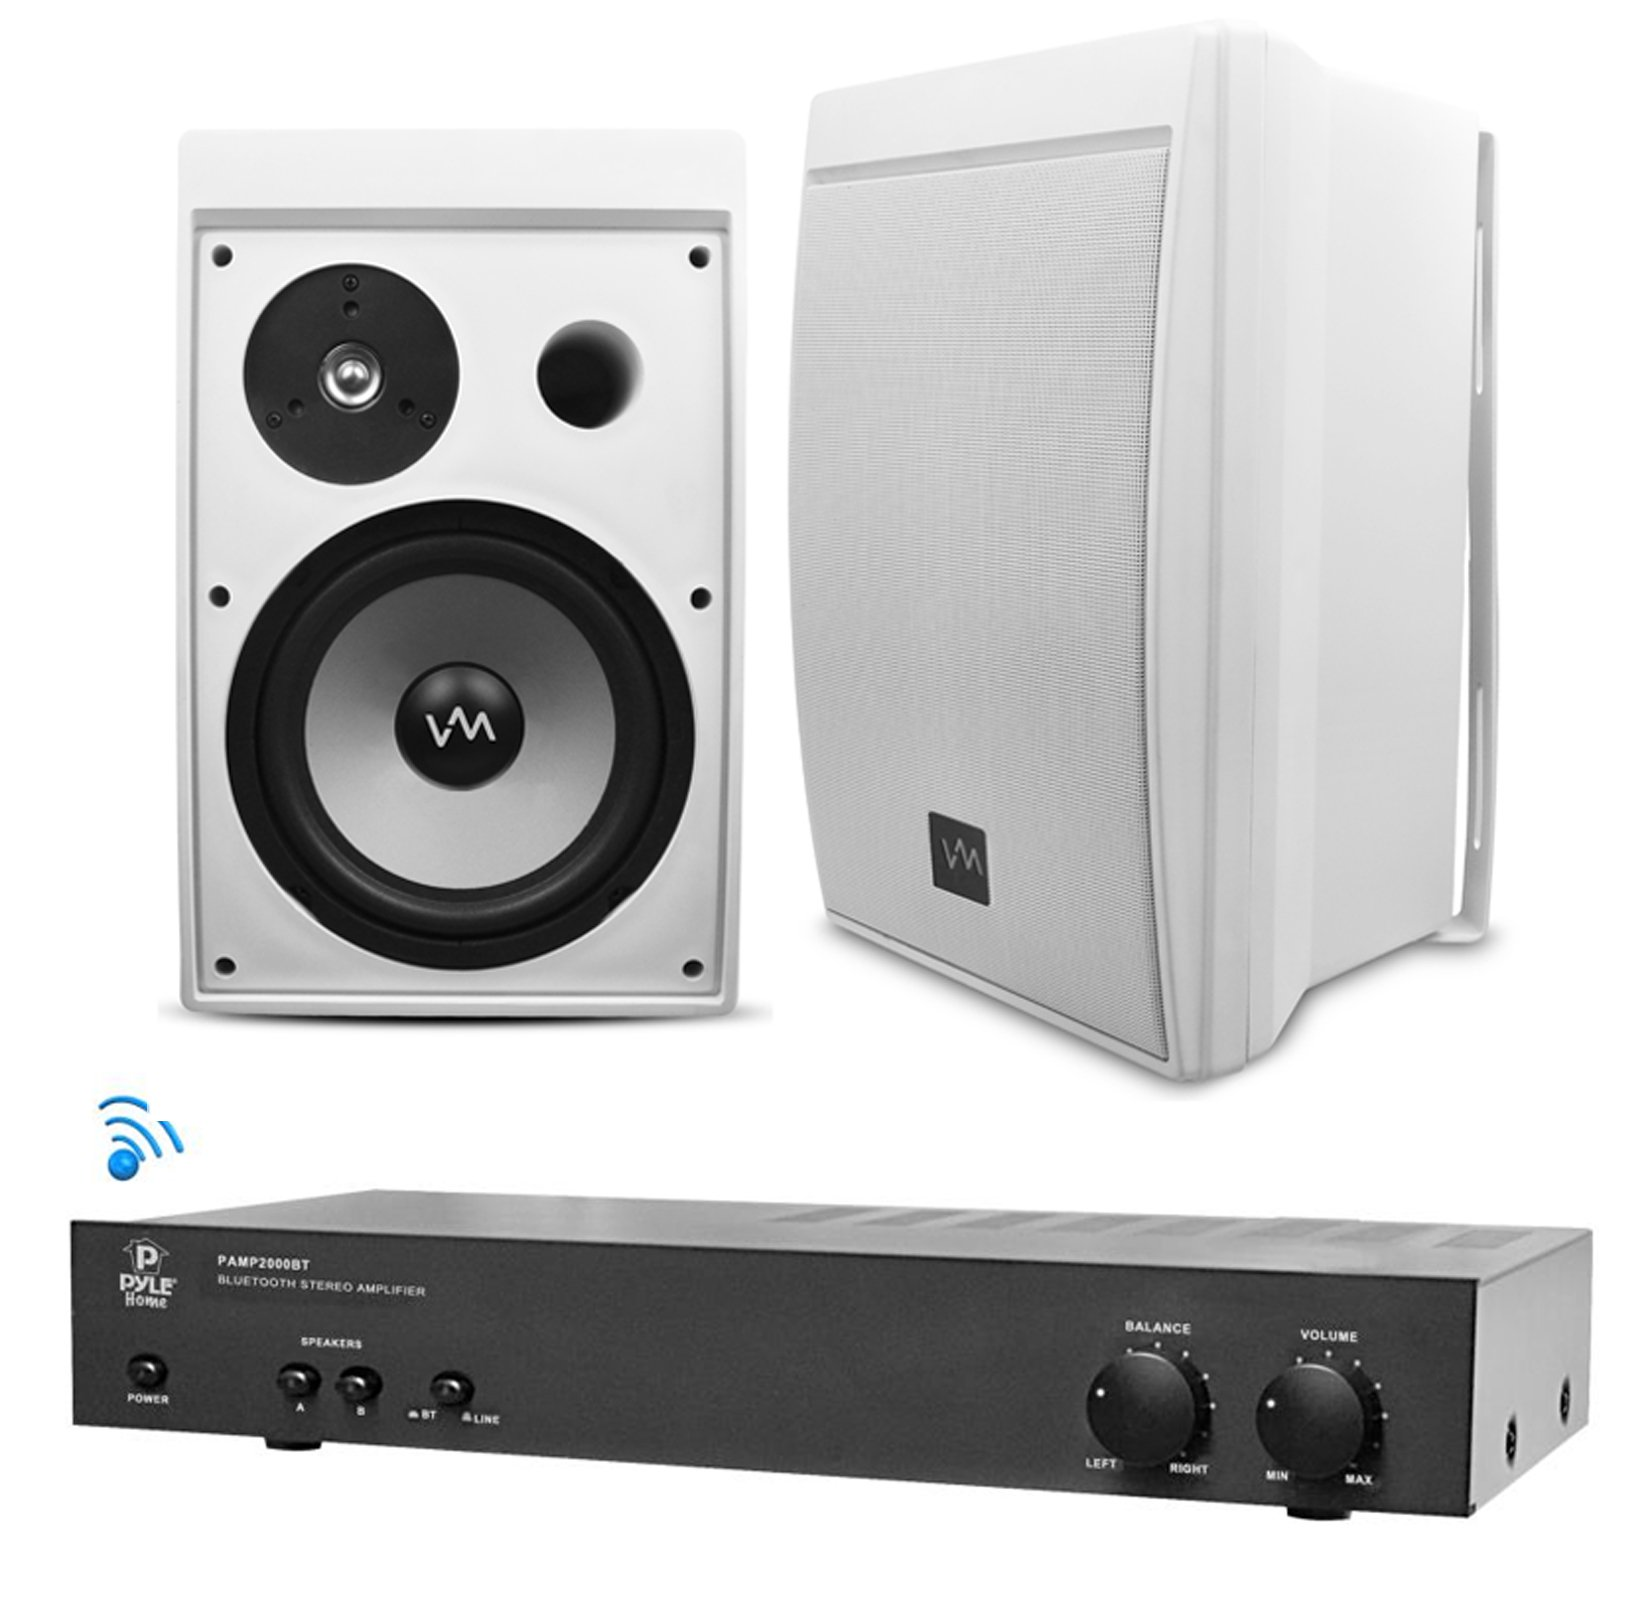 "Bluetooth Outdoor PA Speakers 2) VM Audio 8"" Speakers + Pyle 2000BT Amplifier by Pyle"